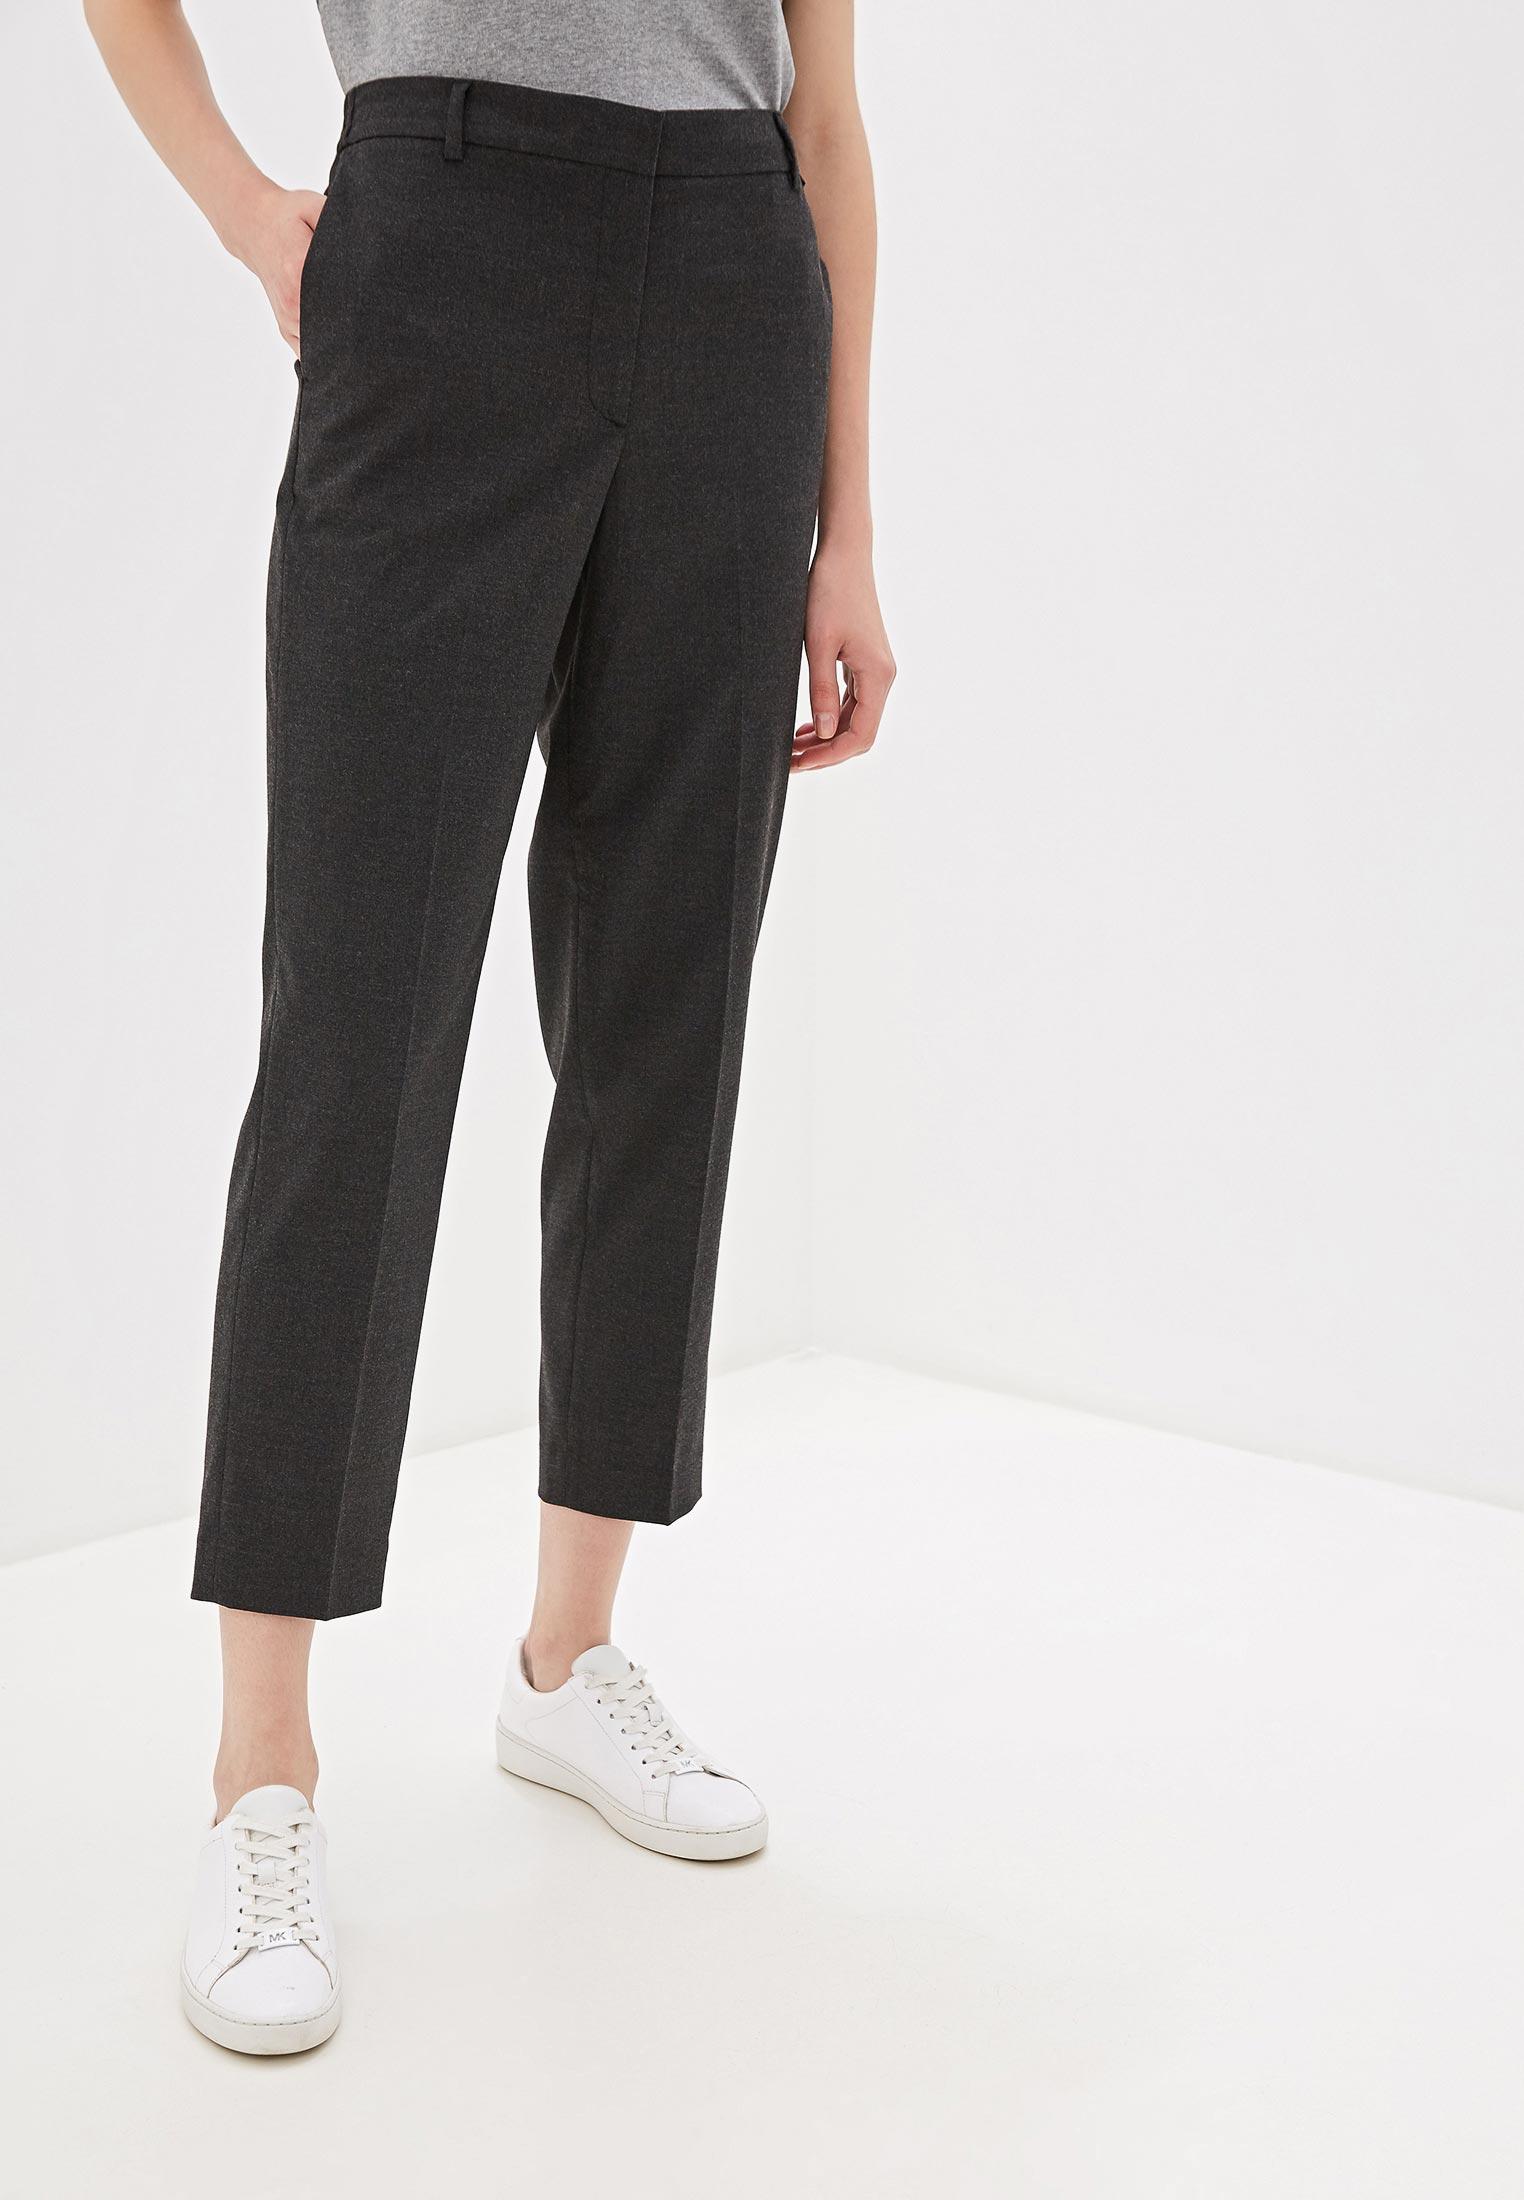 Женские классические брюки Calvin Klein (Кельвин Кляйн) K20K201396